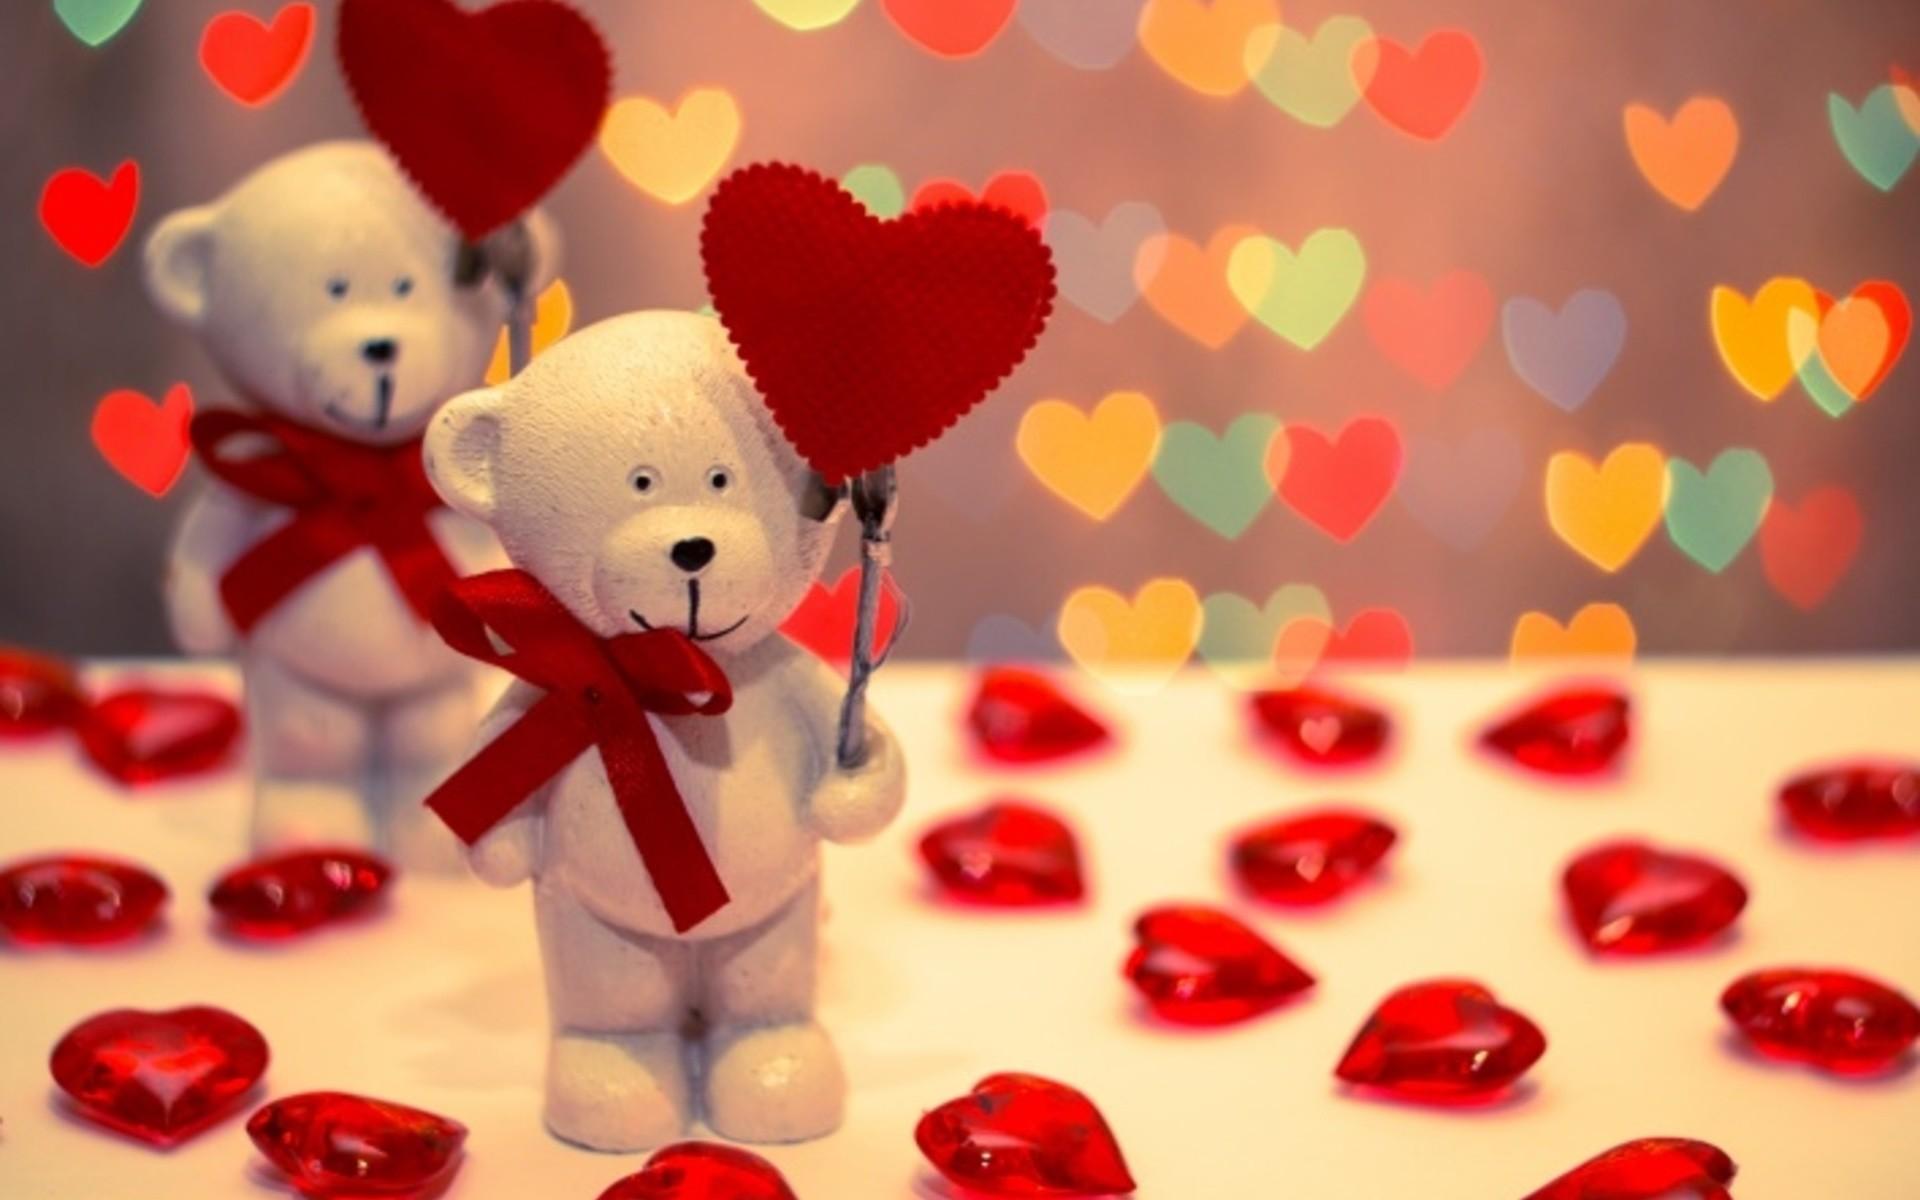 I Love You Teddy Bear Wallpapers Saverwallpaper